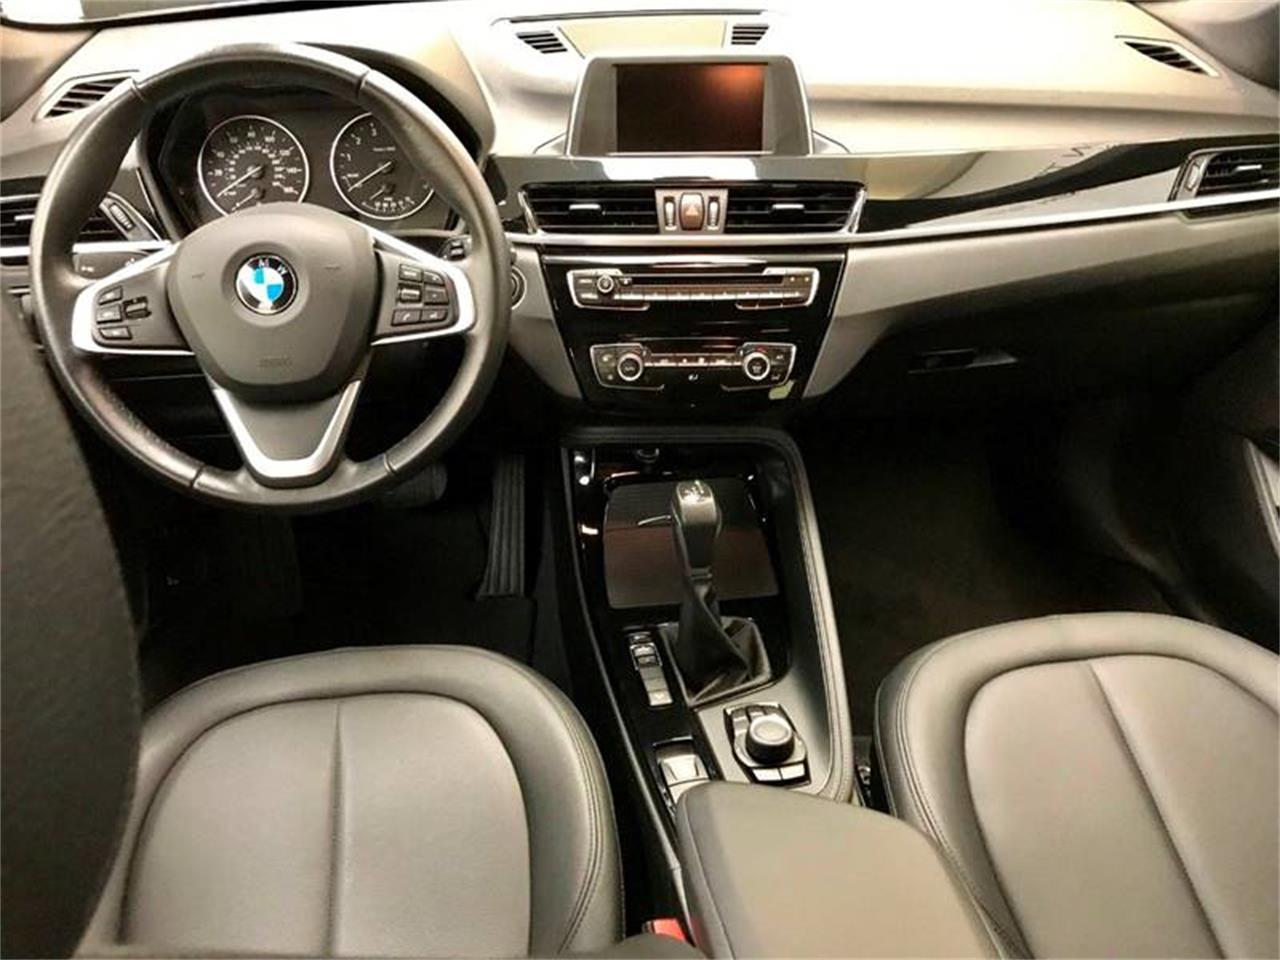 2016 BMW X1 (CC-1192143) for sale in Allison Park, Pennsylvania